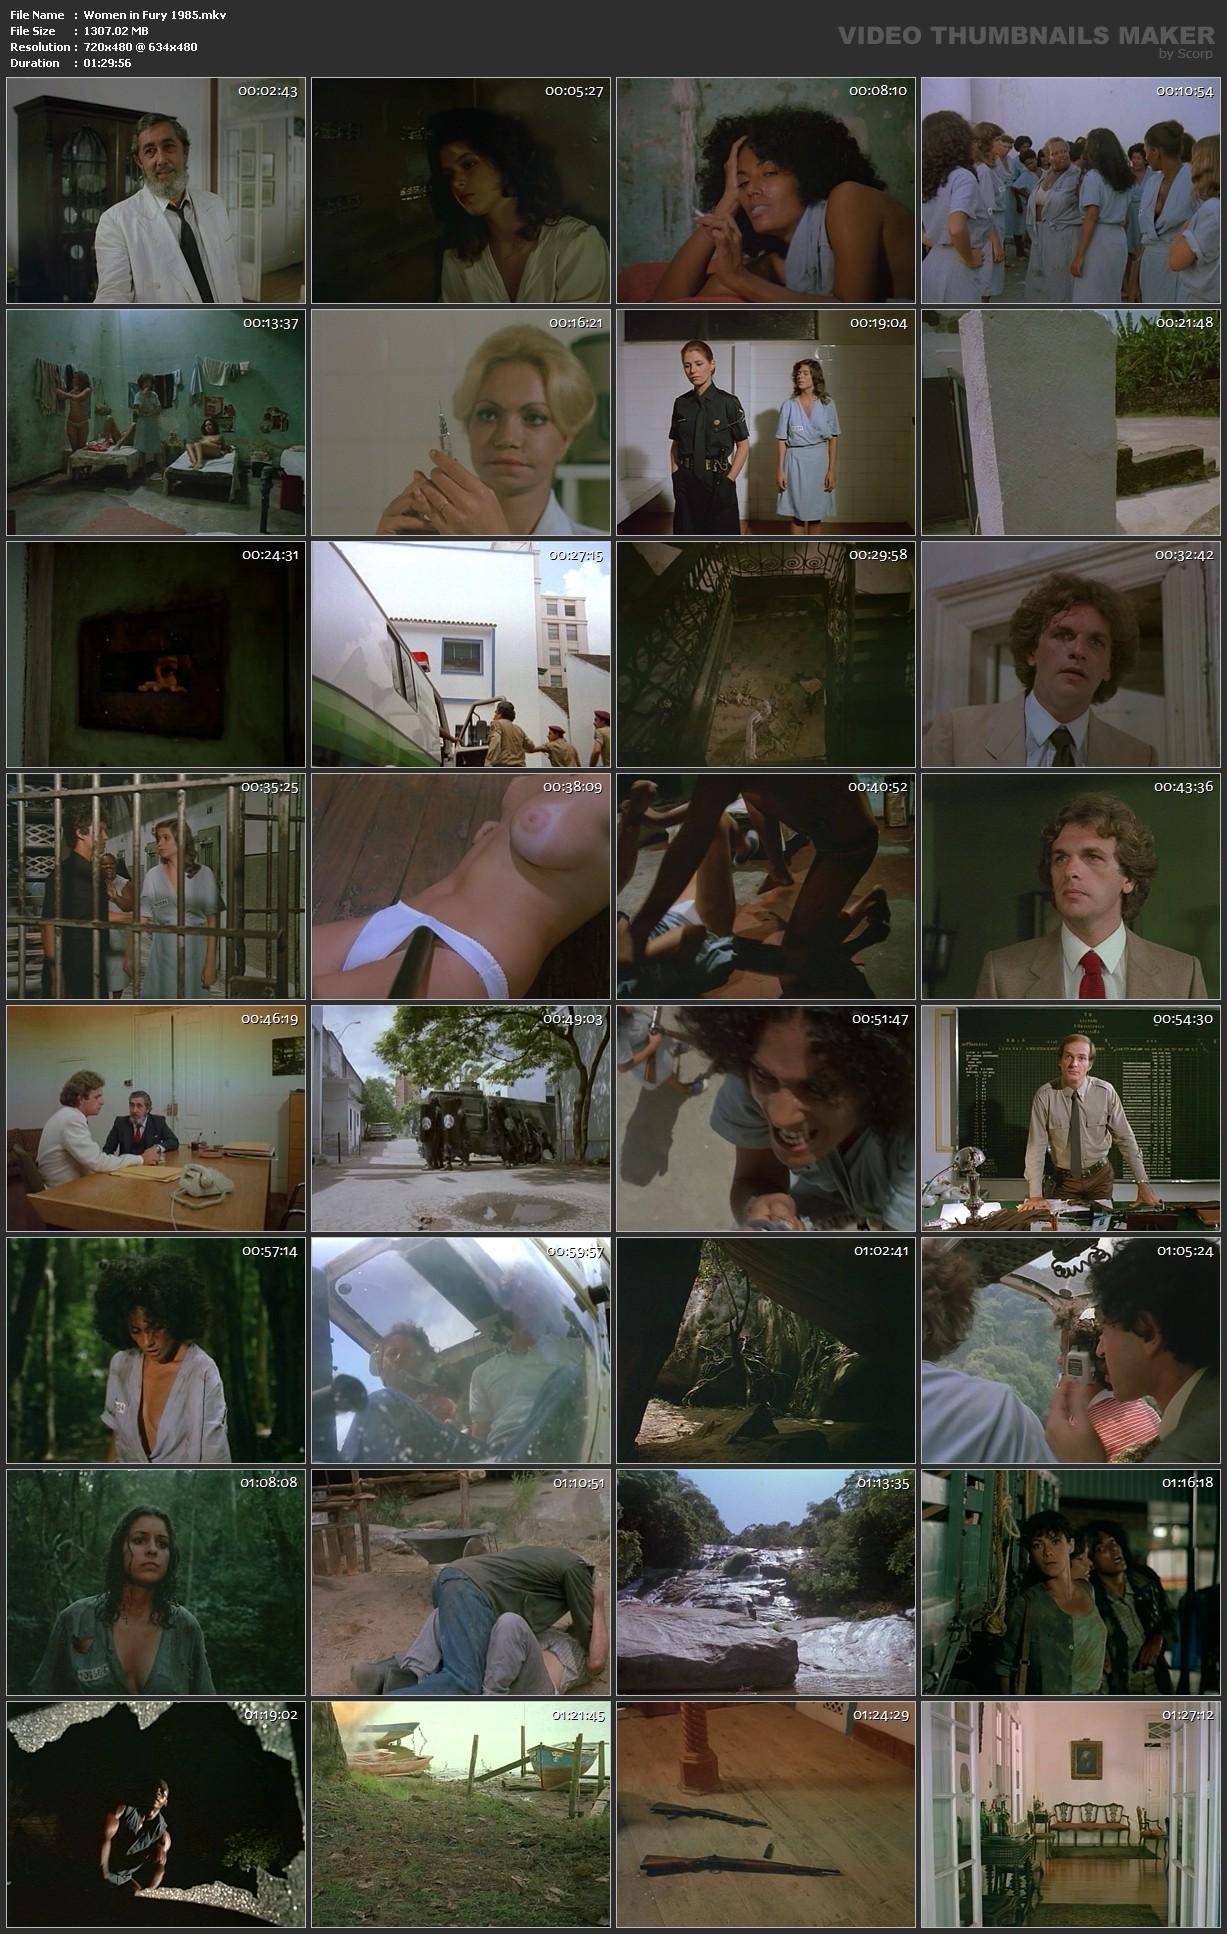 women in fury 1985 full movie